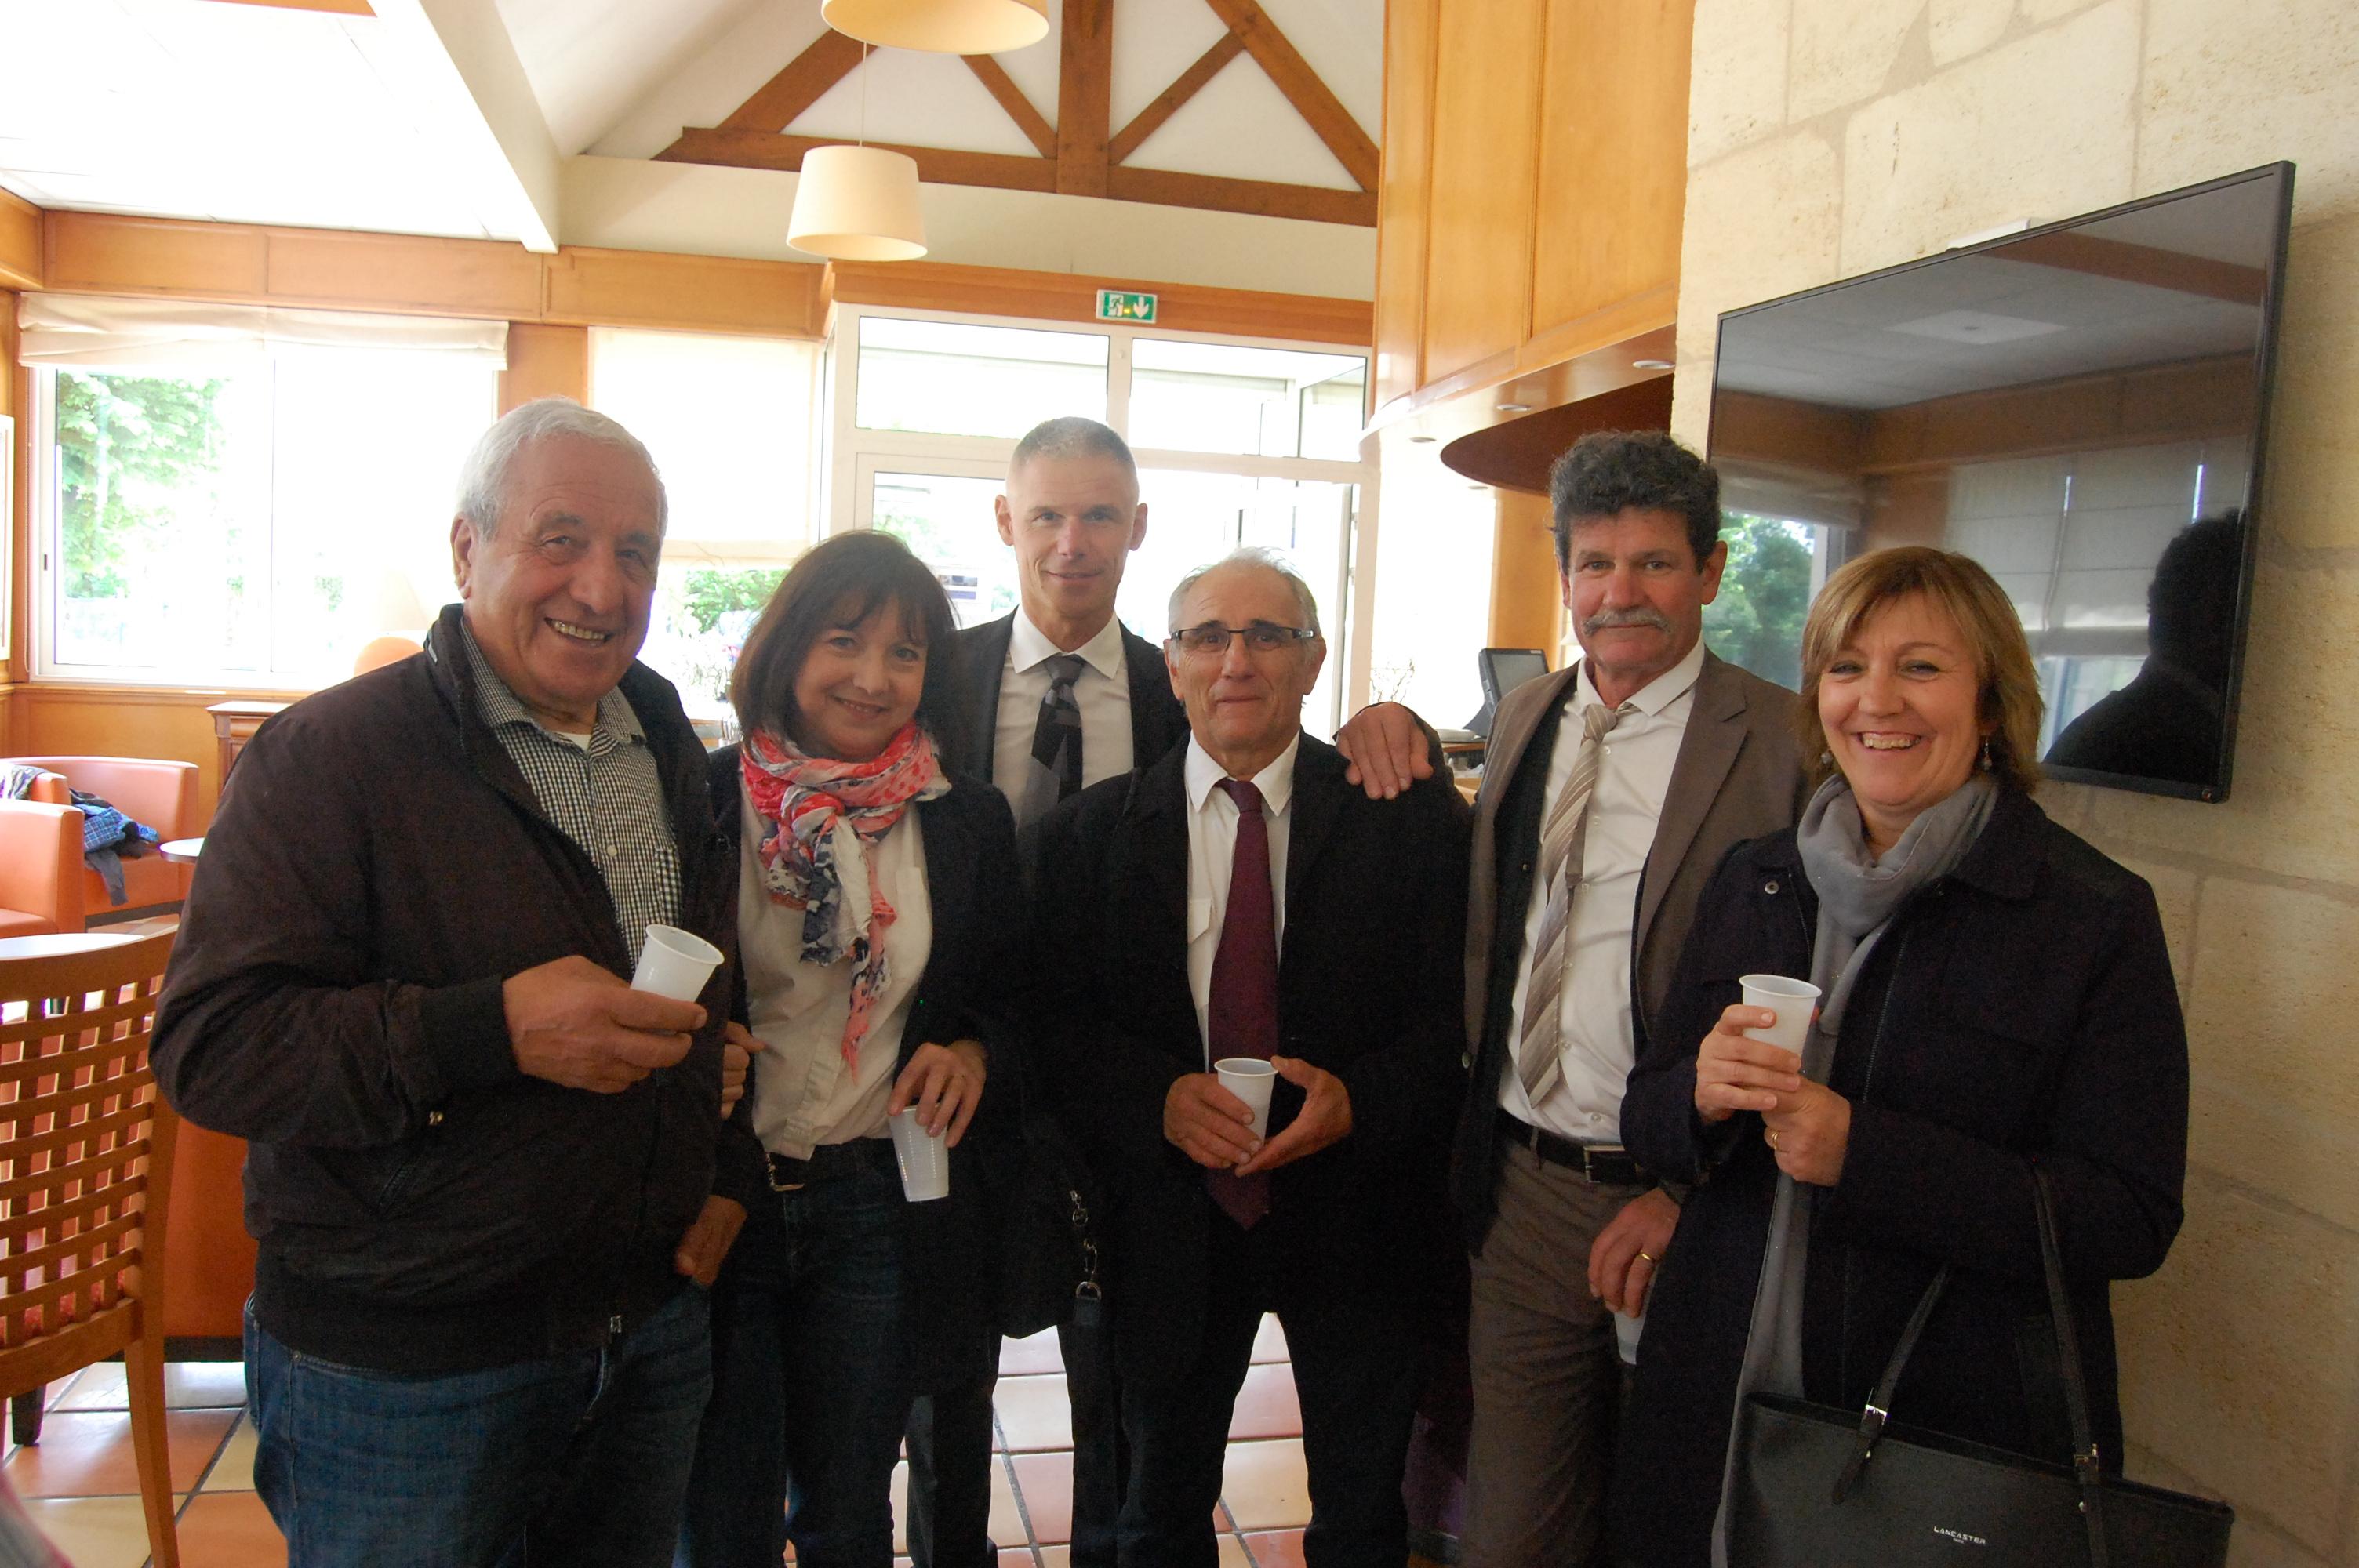 020 AG 2017 Blanquefort Repas samedi midi (5)